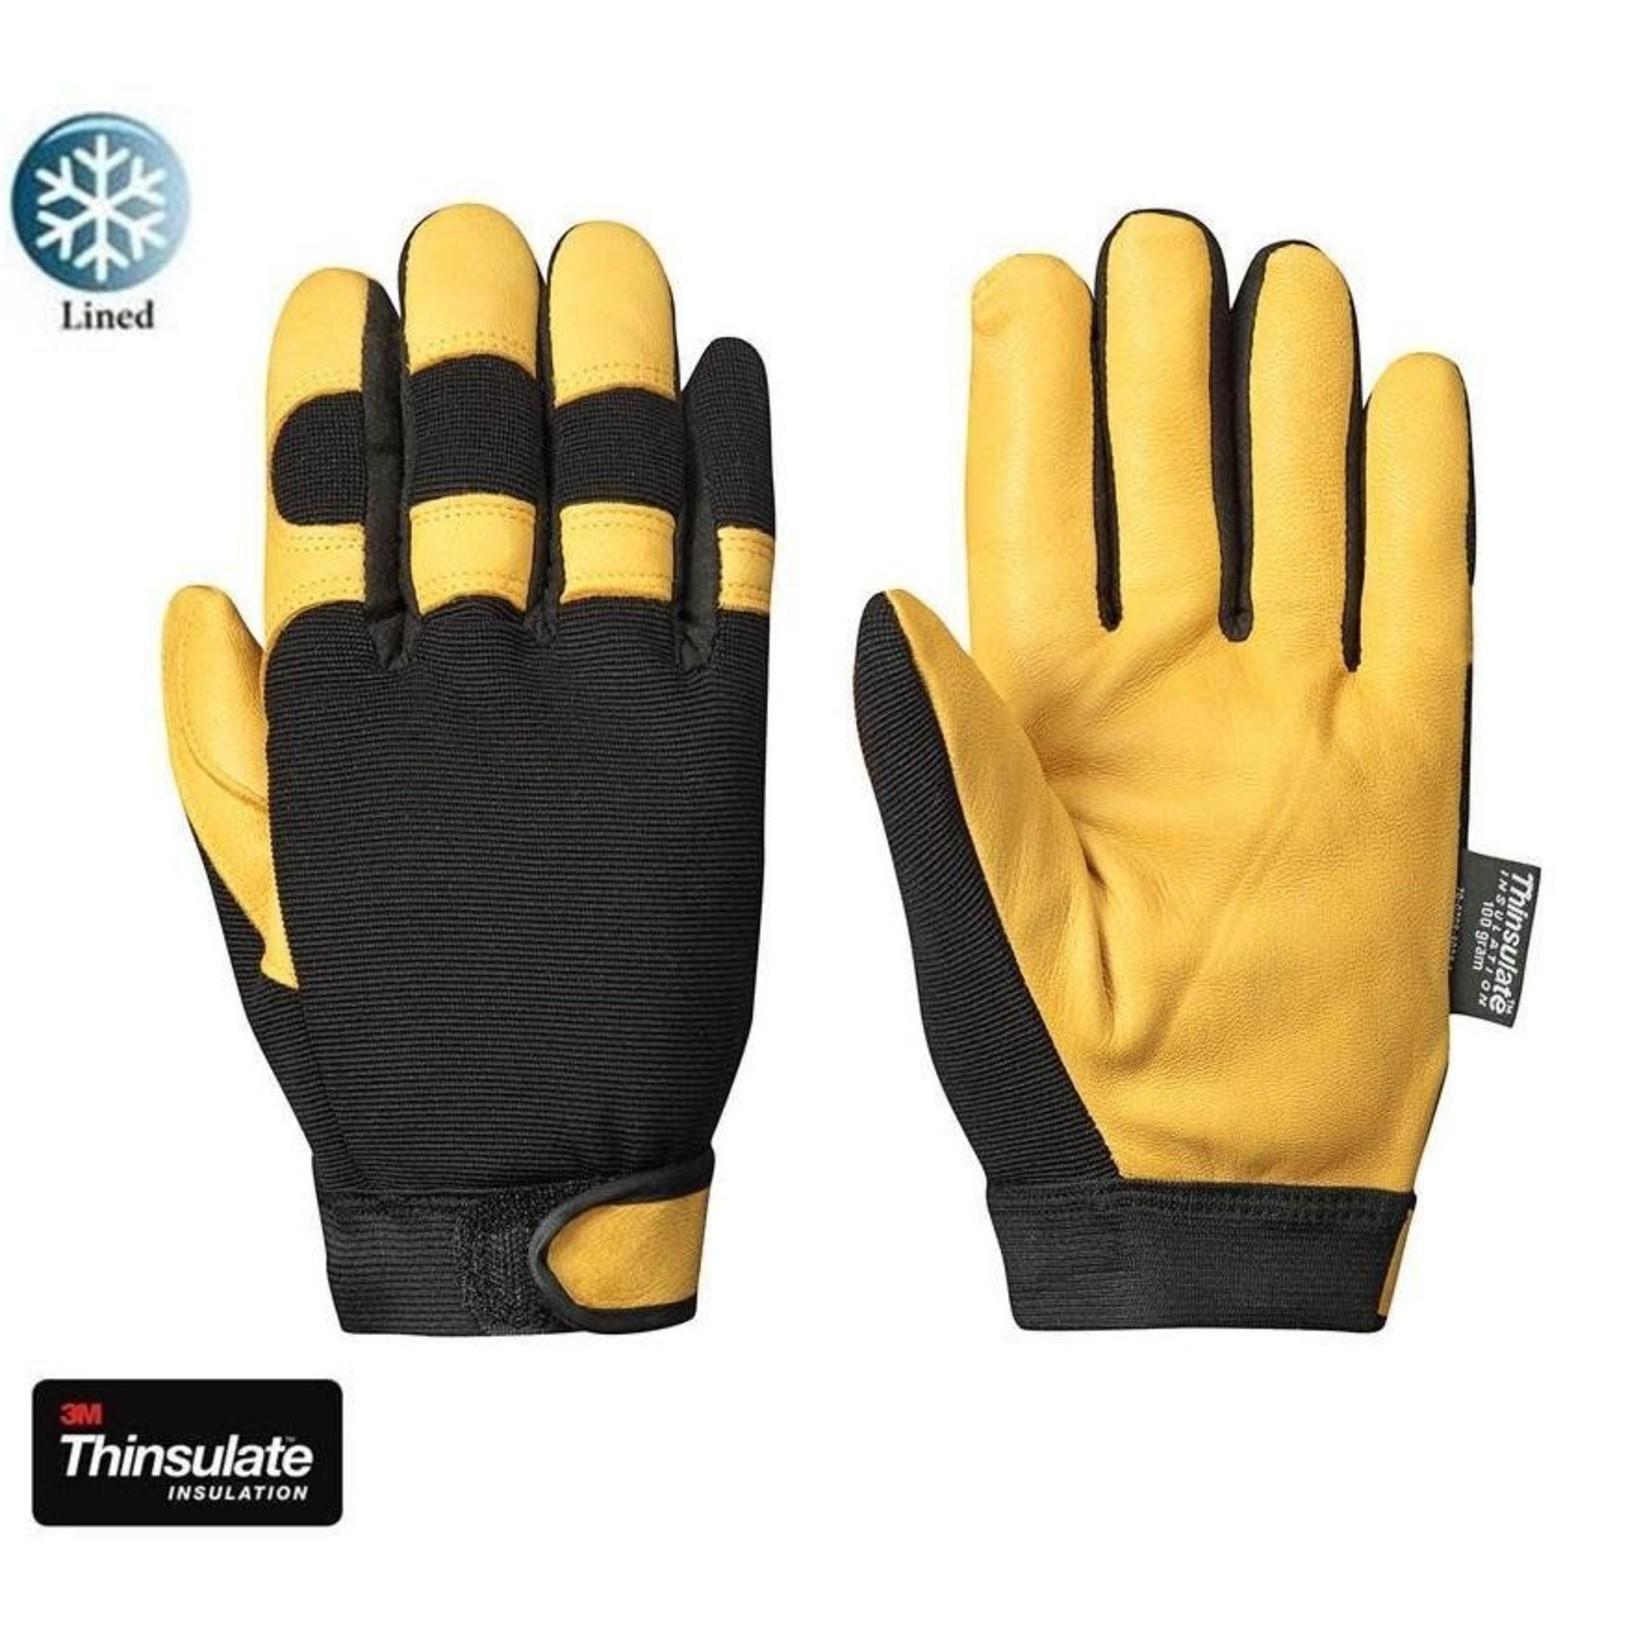 Pioneer Pioneer #890 Mechanic style ergonomic glove